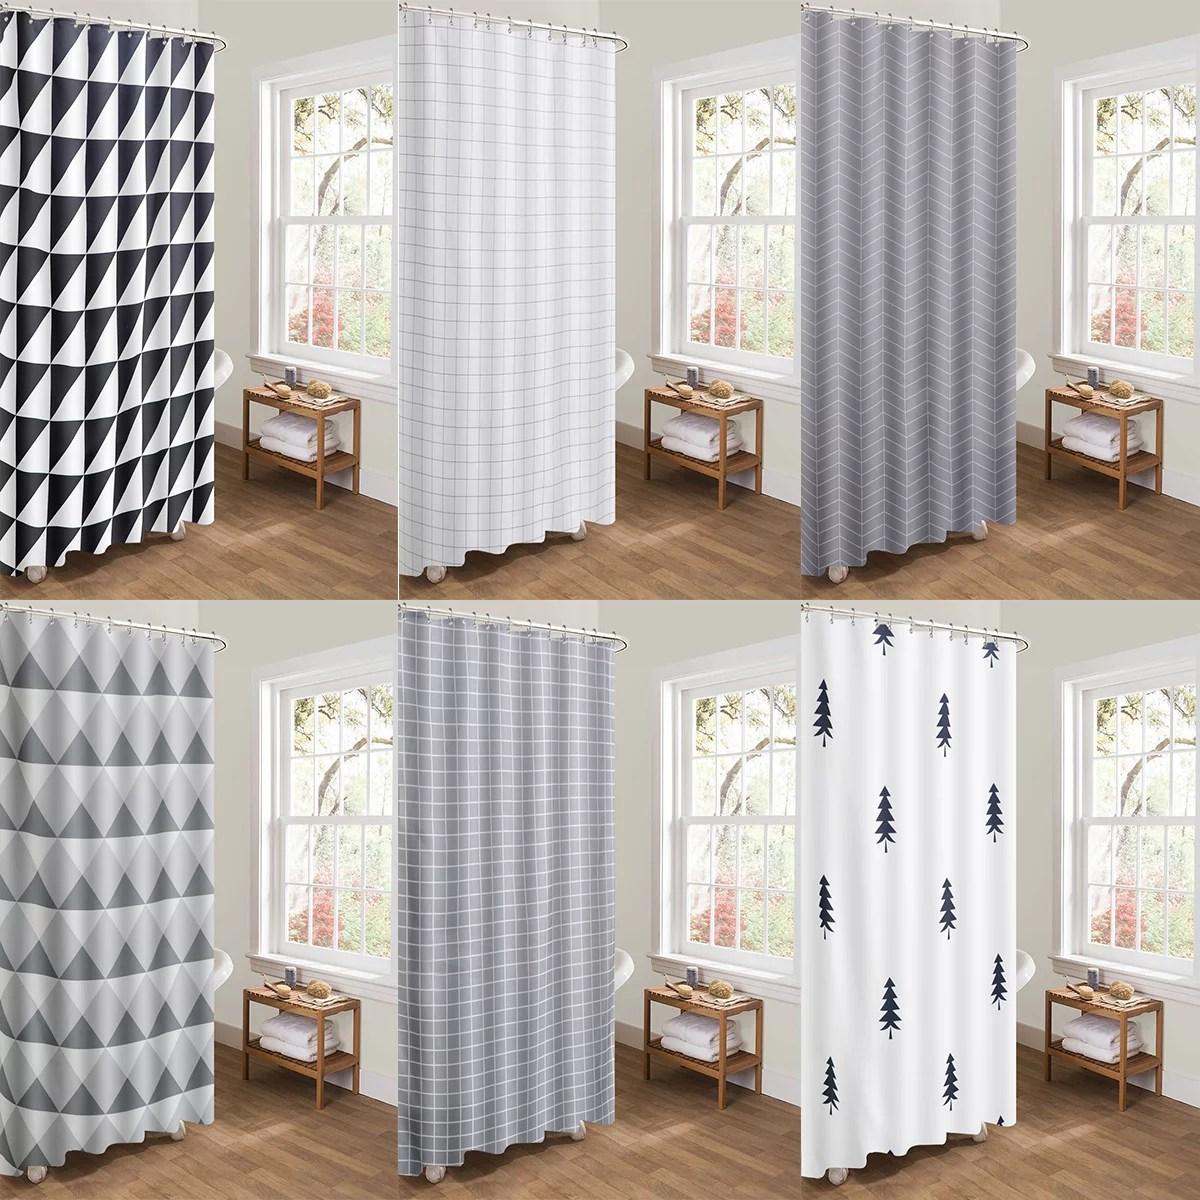 ukap new modern bathroom shower curtain with ring hooks 180 x 180 cm stripe spots